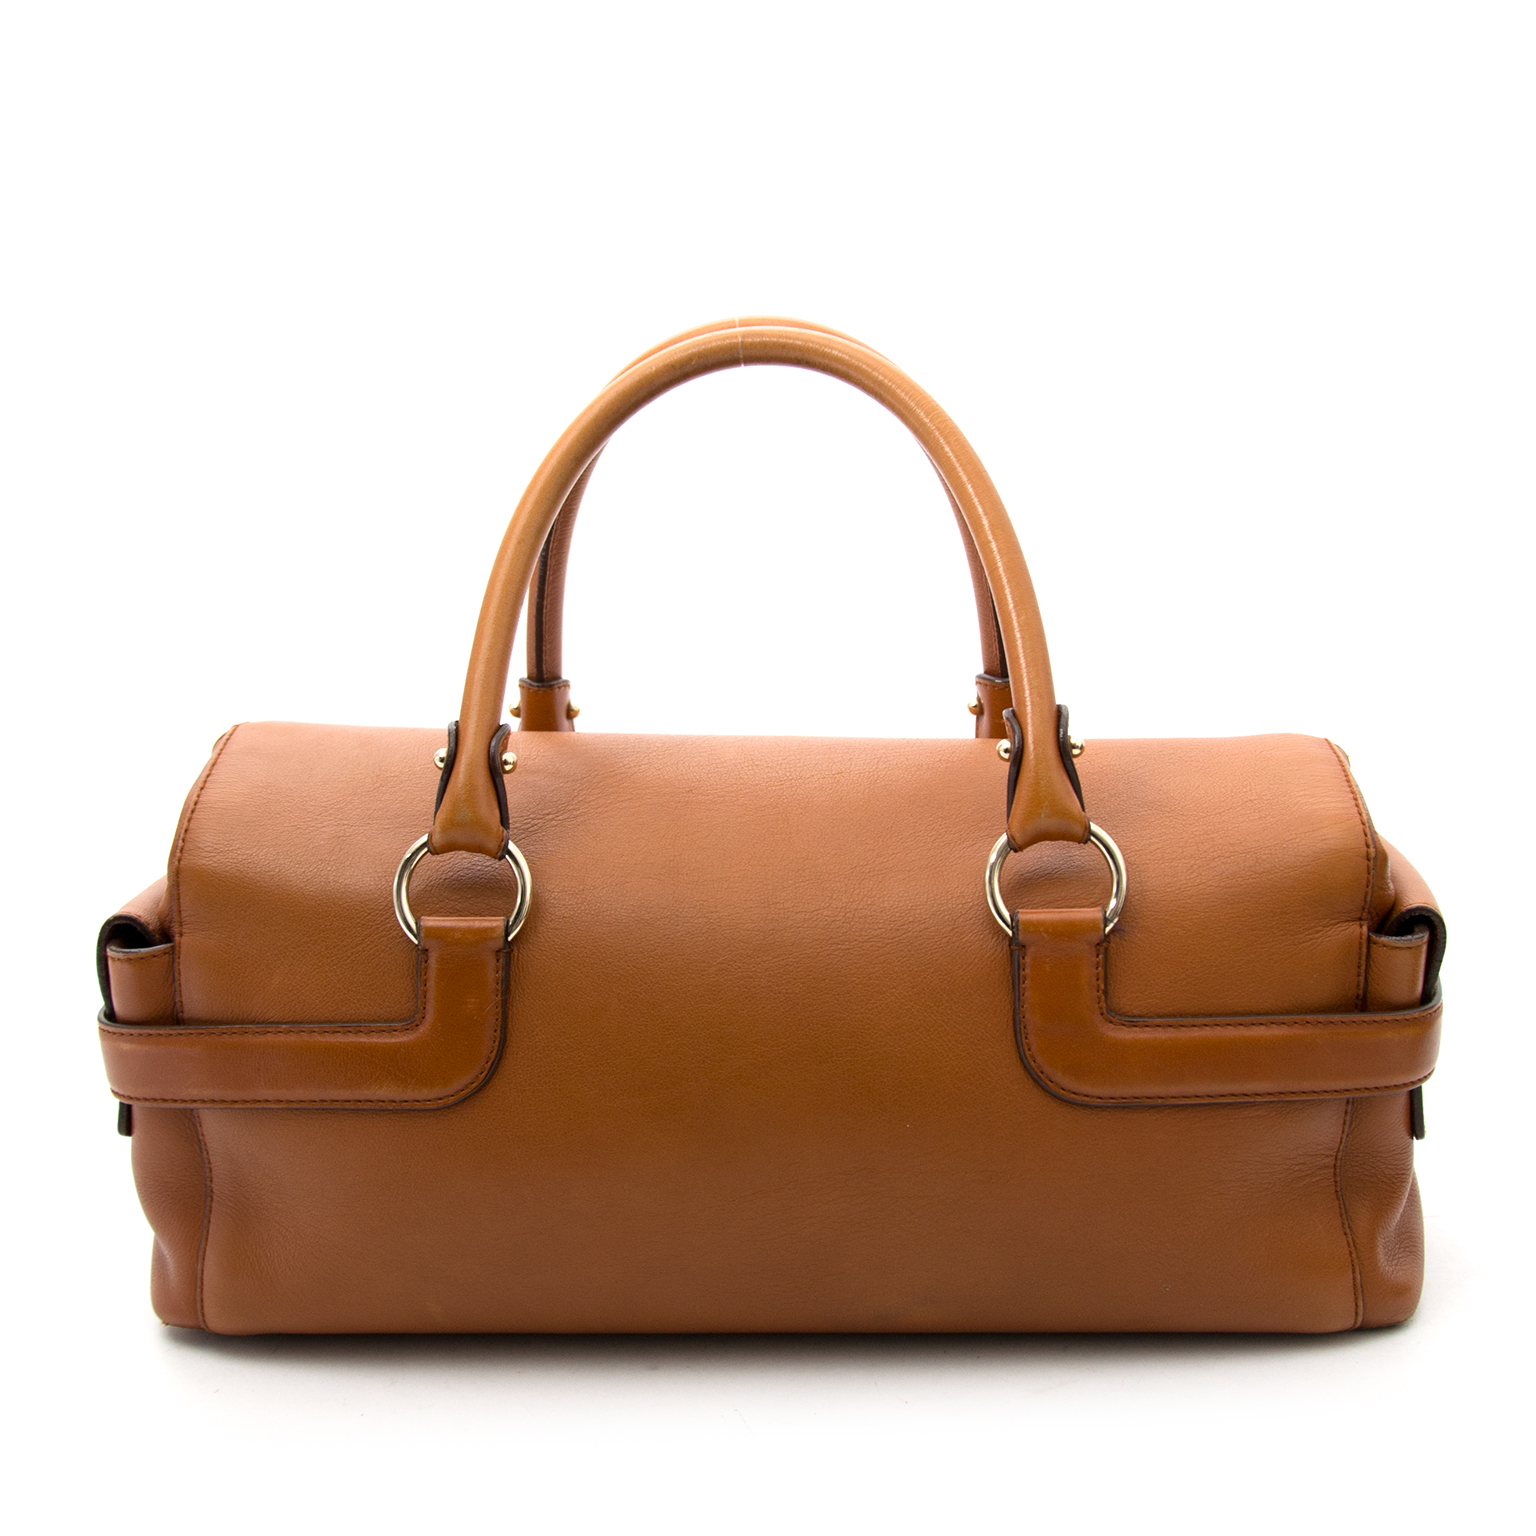 shop safe online secondhand Salvatore Ferragamo Sofia Cognac Handbag